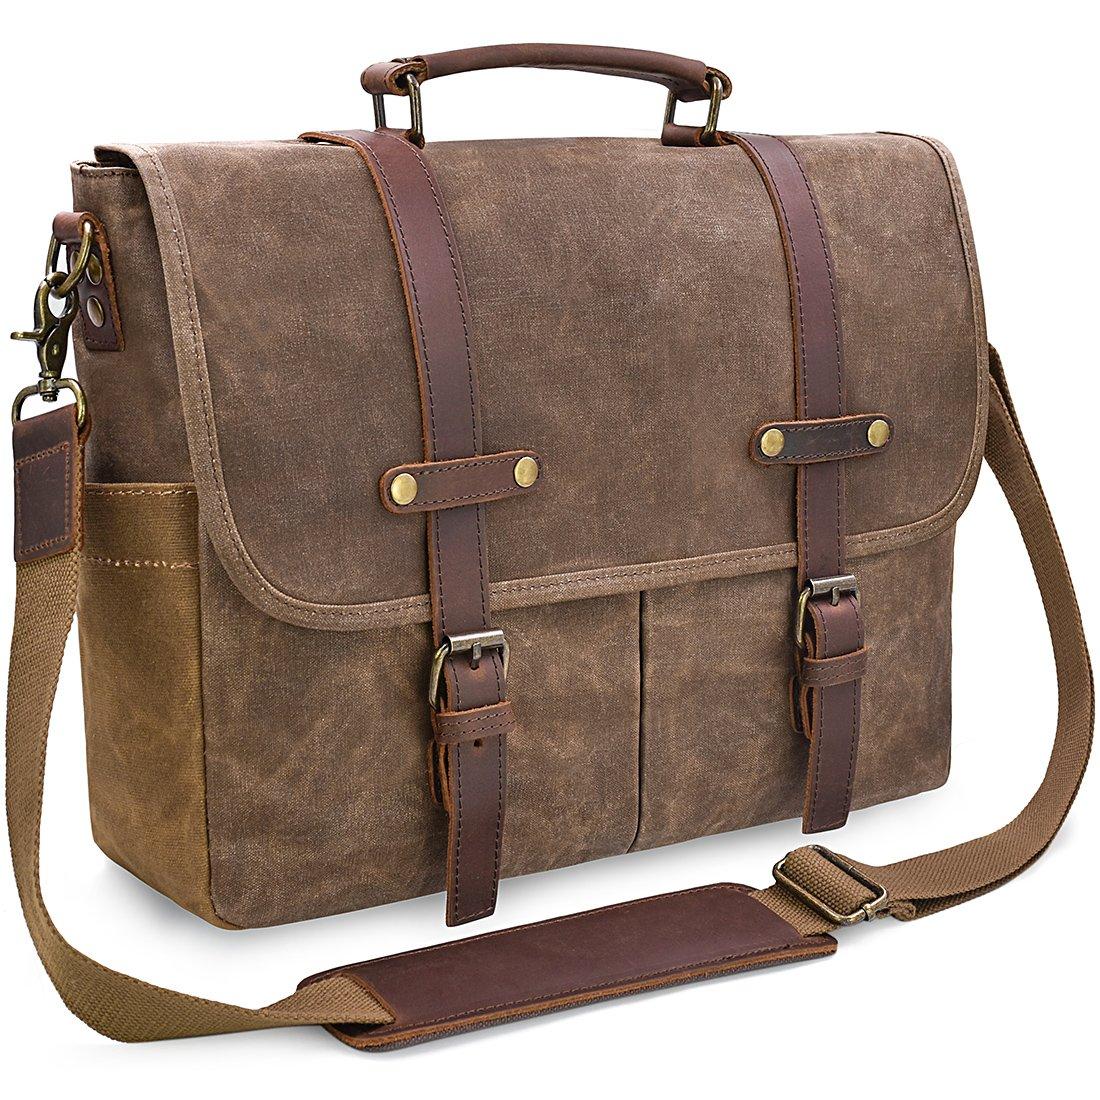 Mens Messenger Bag 15.6 Inch Waterproof Vintage Genuine Leather Waxed Canvas Briefcase Large Satchel Shoulder Bag Rugged Leather Computer Laptop Bag, Grey NEWHEY